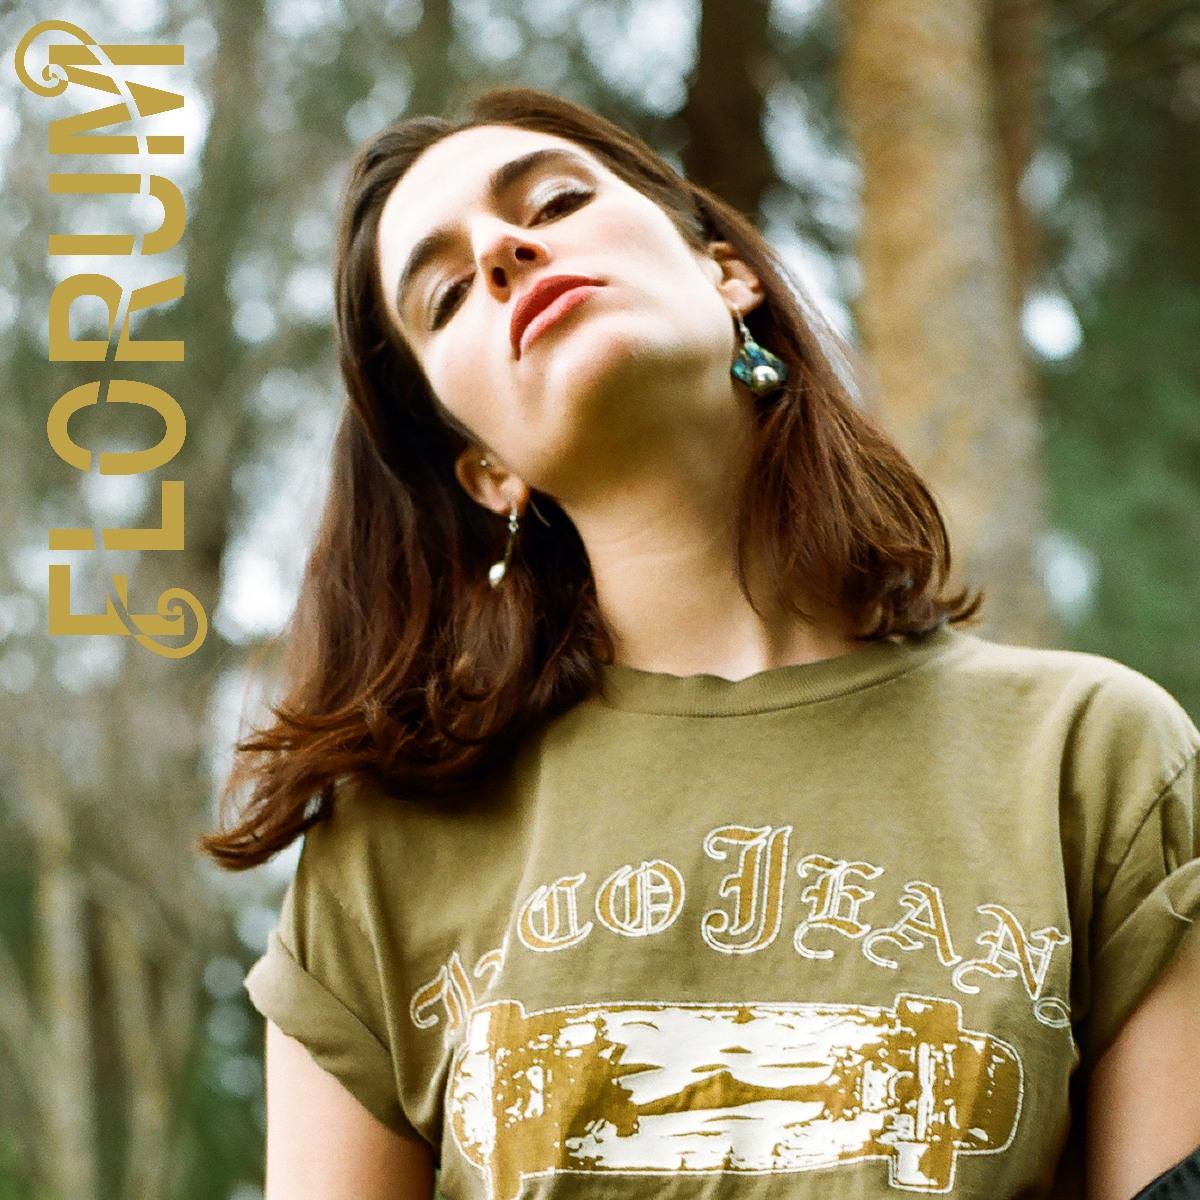 durabilité - Phlemuns - florum fashion magazine - mandi k smith - promise harvey - Kayla Gallagher Margaux Models LA - Sustainble - Slow Fashion Movement - vintage